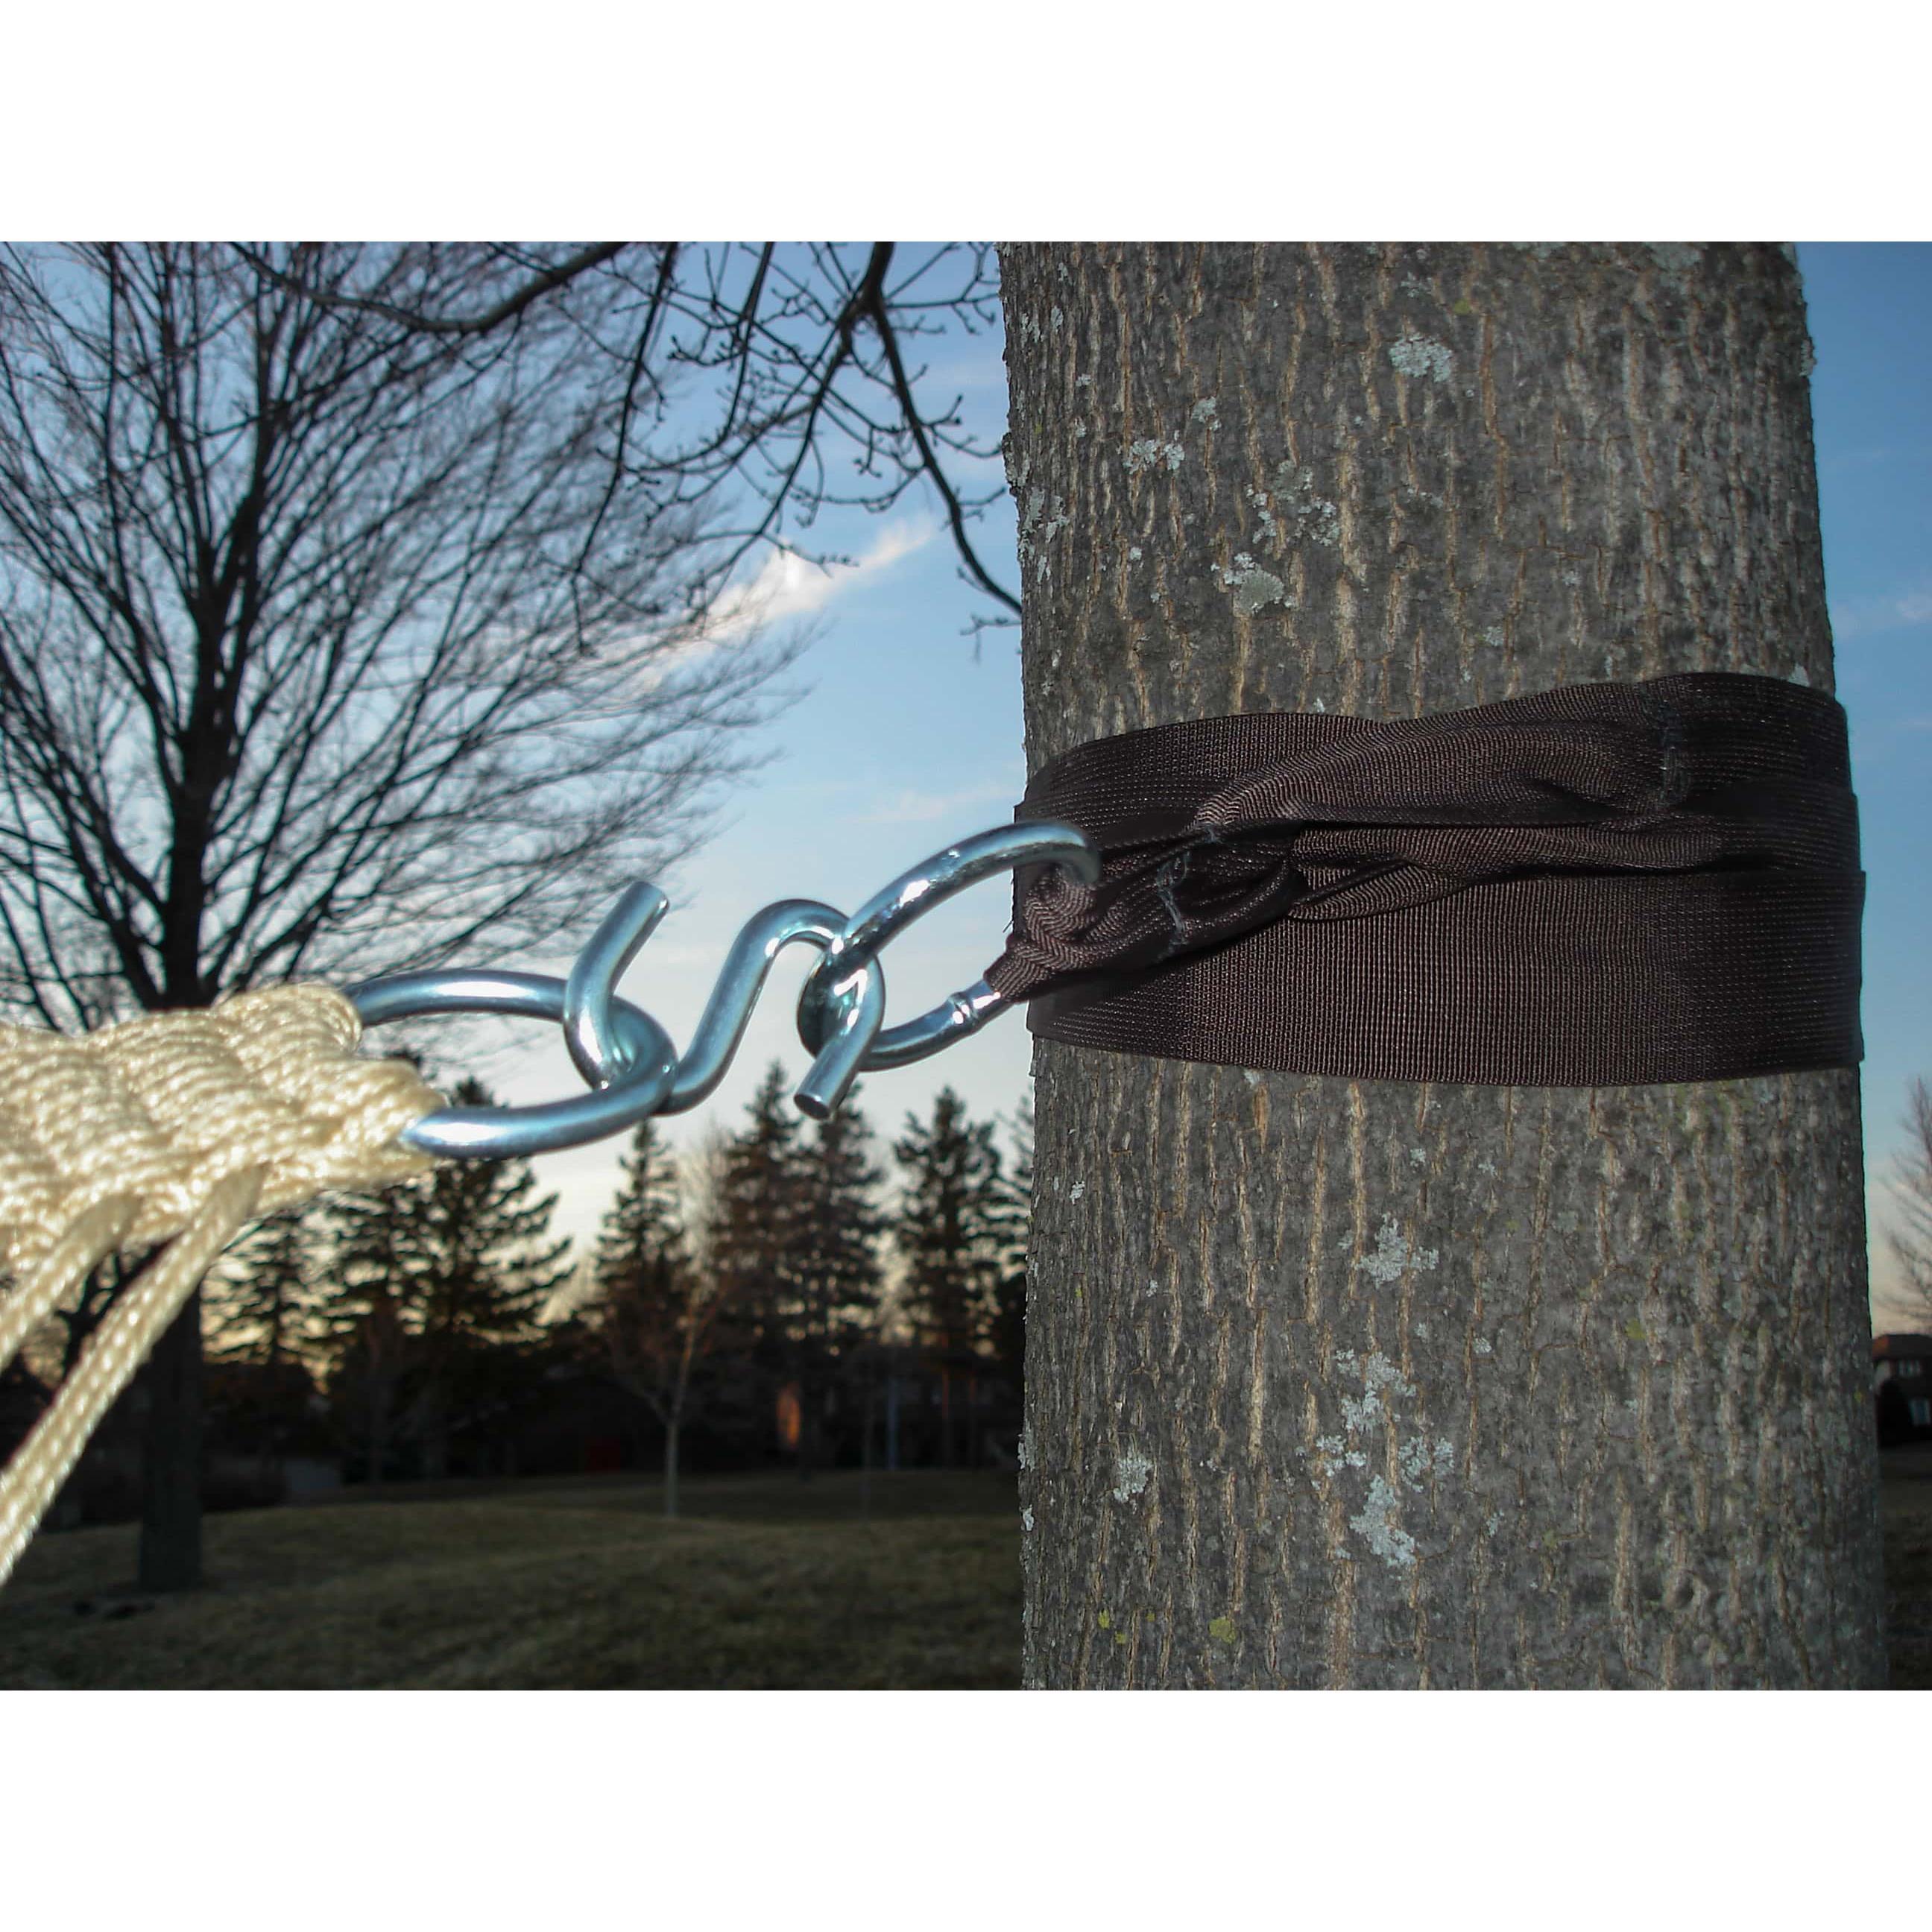 Vivere Eco-Friendly Hammock Tree Straps (2 Pack)